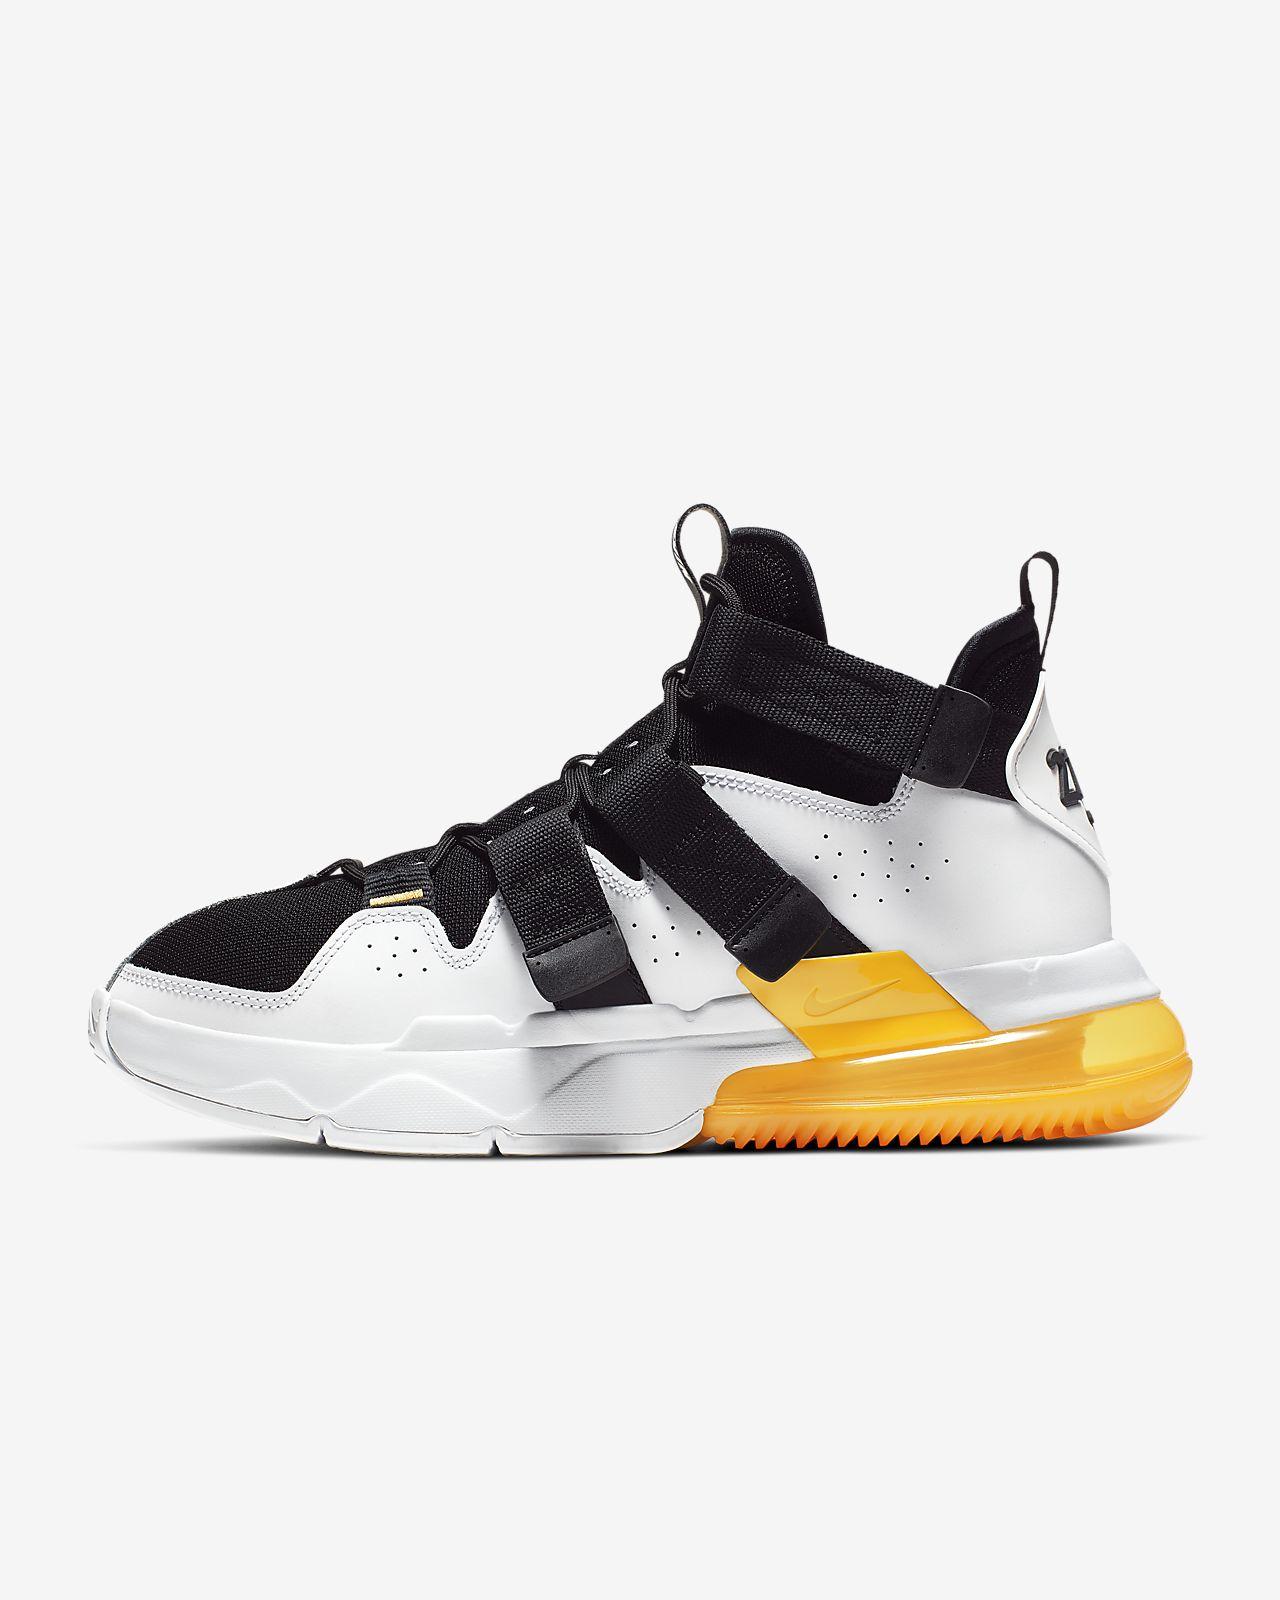 Nike Air Edge 270 Men's Shoe